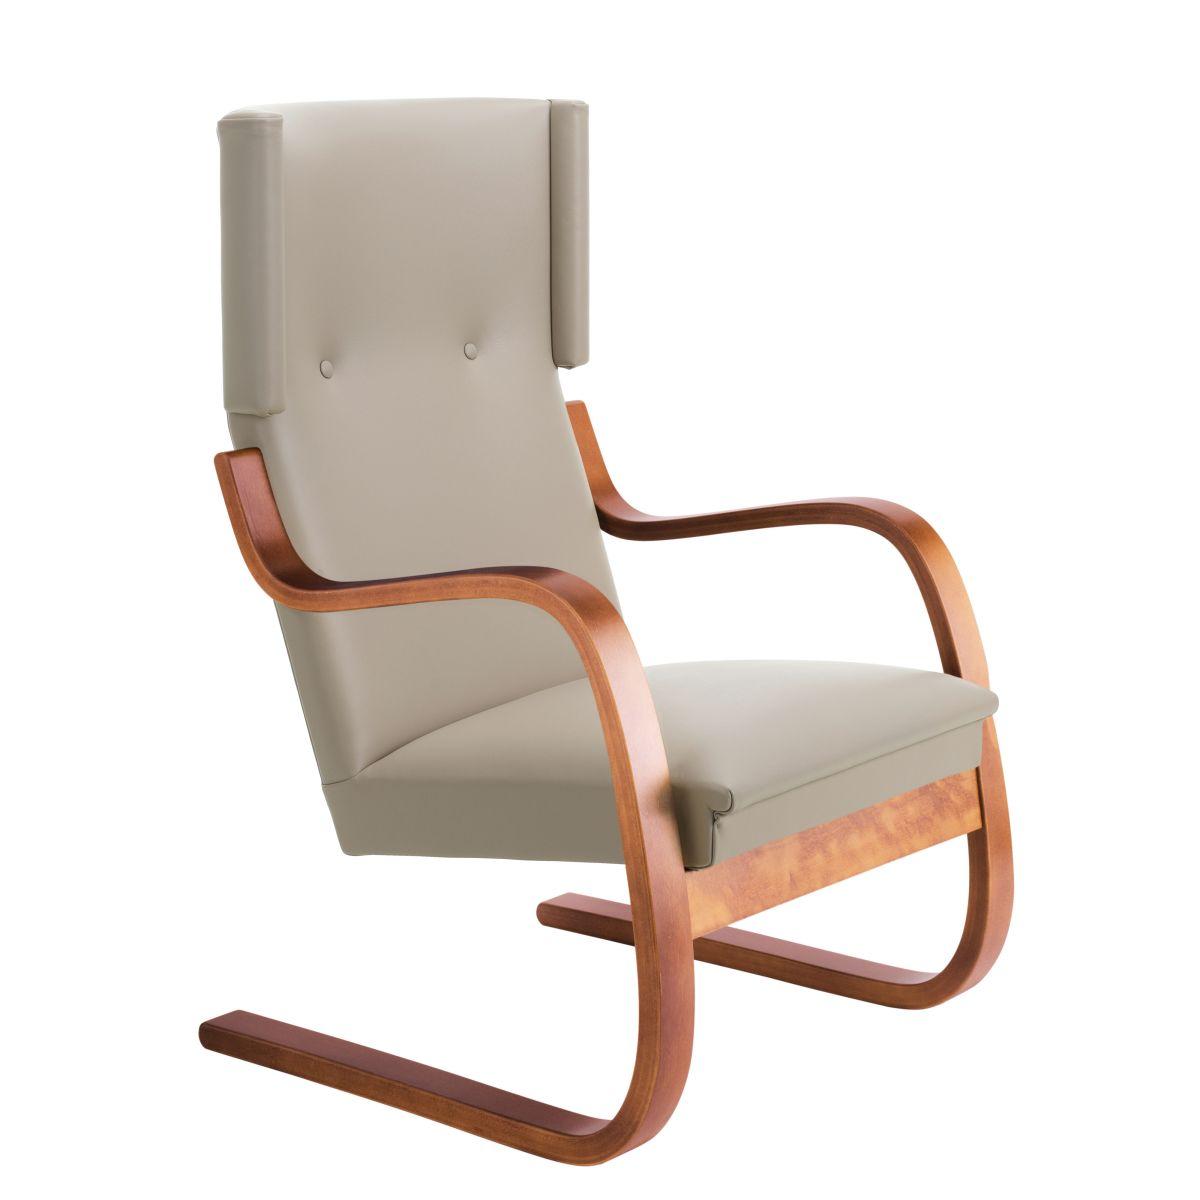 Armchair-401-walnut-stain_seat-upholstery-Sörensen-Prestige-beige_F-2912664